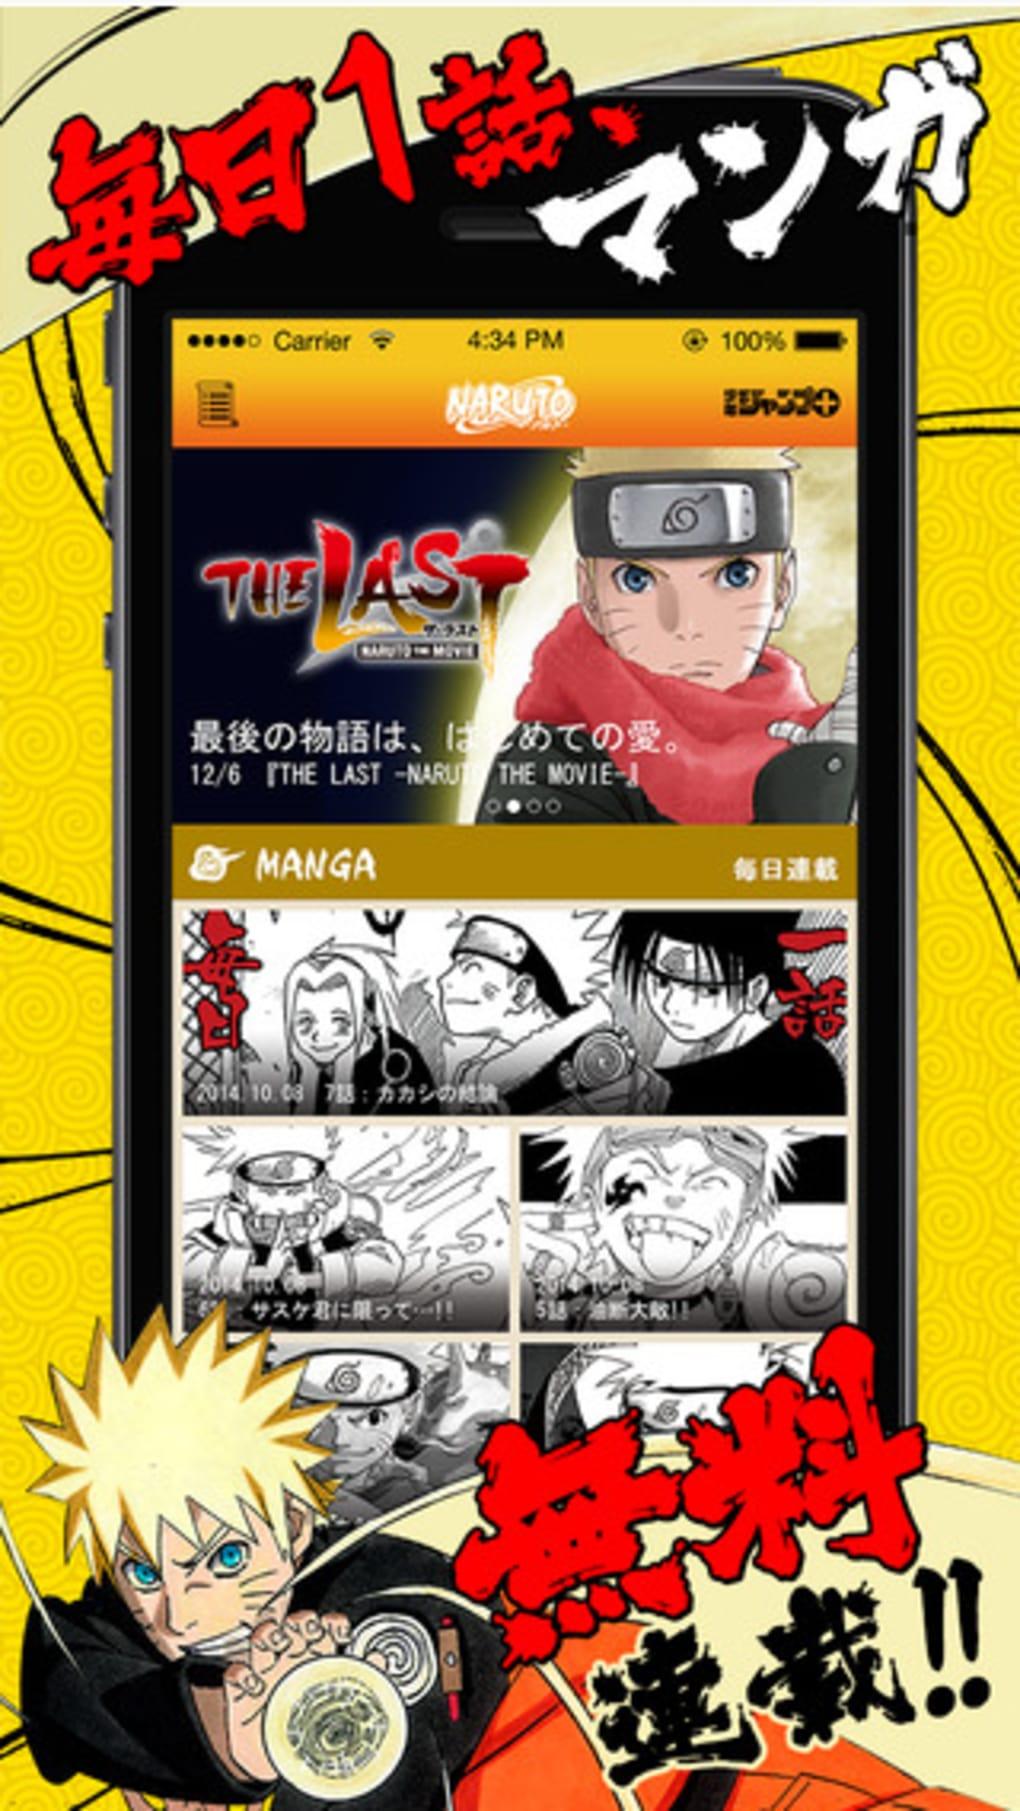 Naruto ナルト 無料マンガ連載無料アニメ放送公式アプリ For Iphone